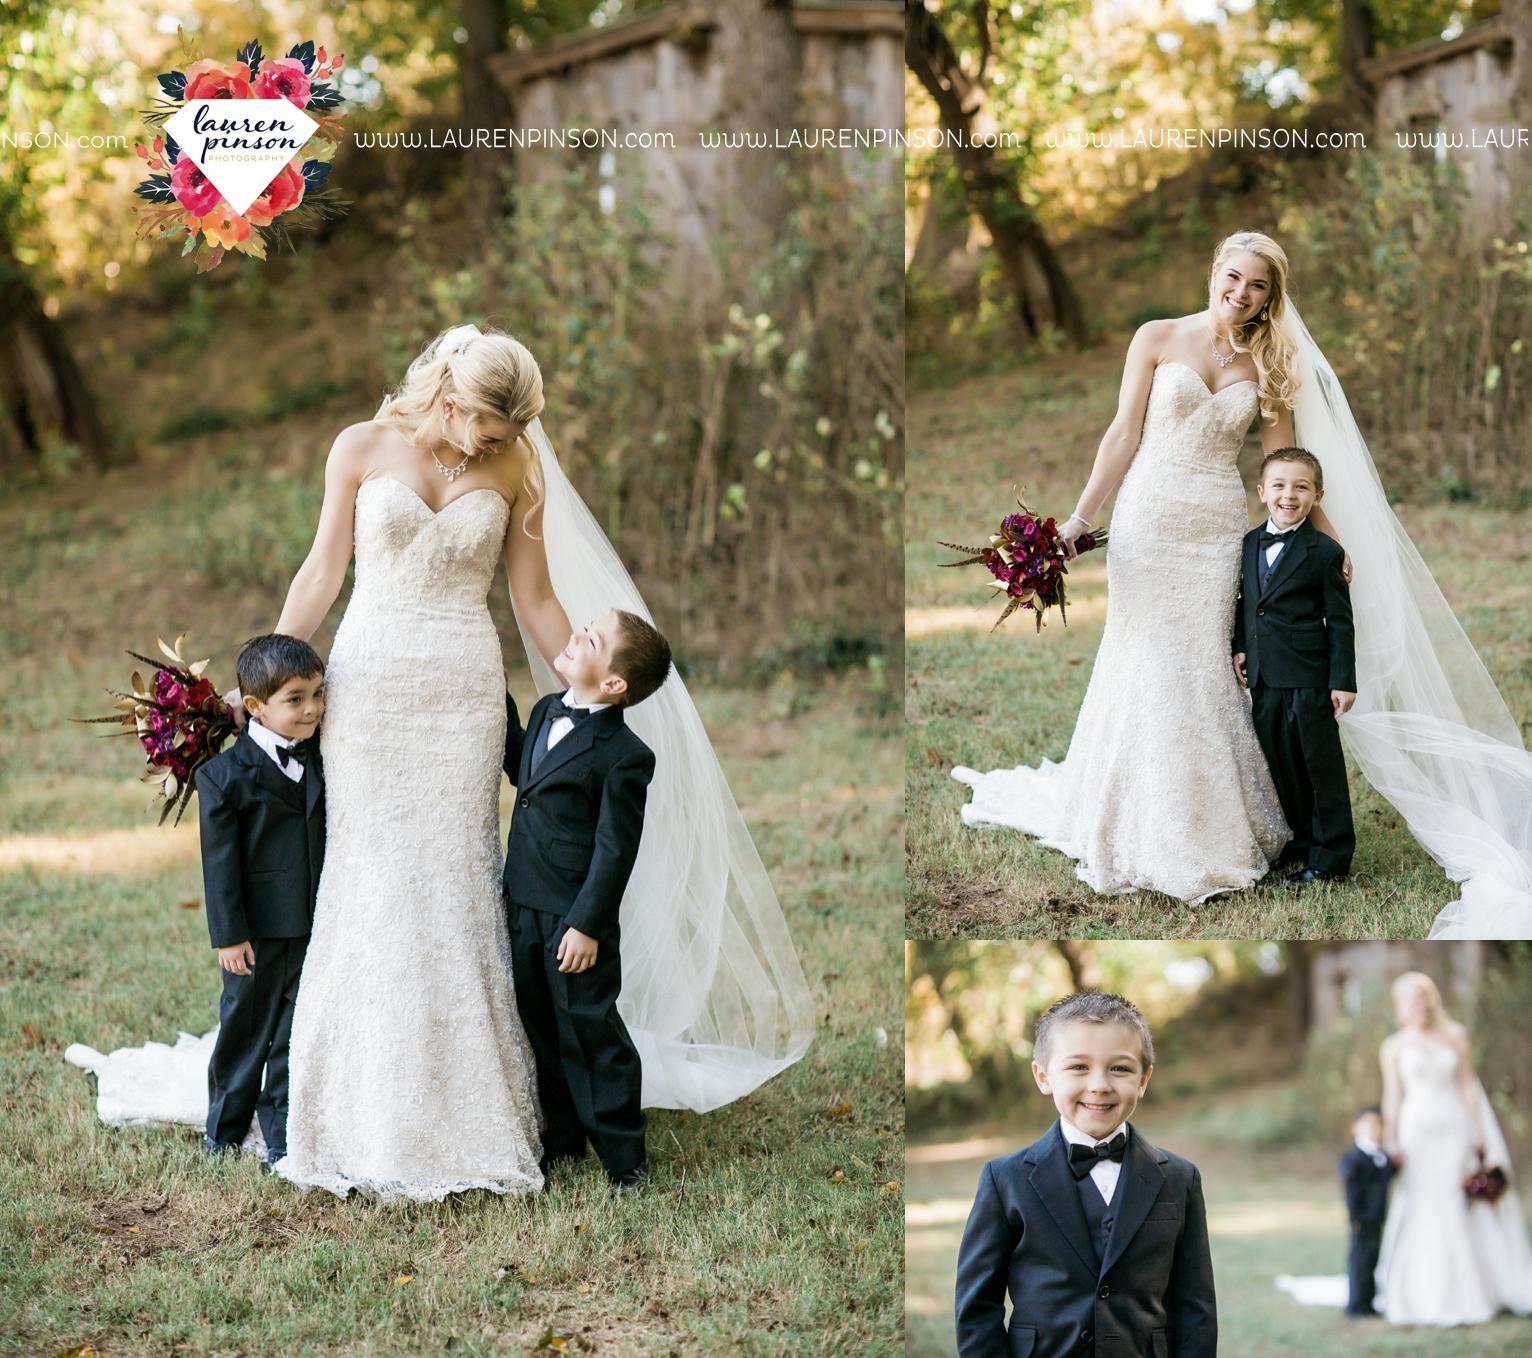 rustic-wichita-falls-texas-wedding-photographer-gold-glam-mayfield-events-market-street-united-allue-bridals-fall_1730.jpg